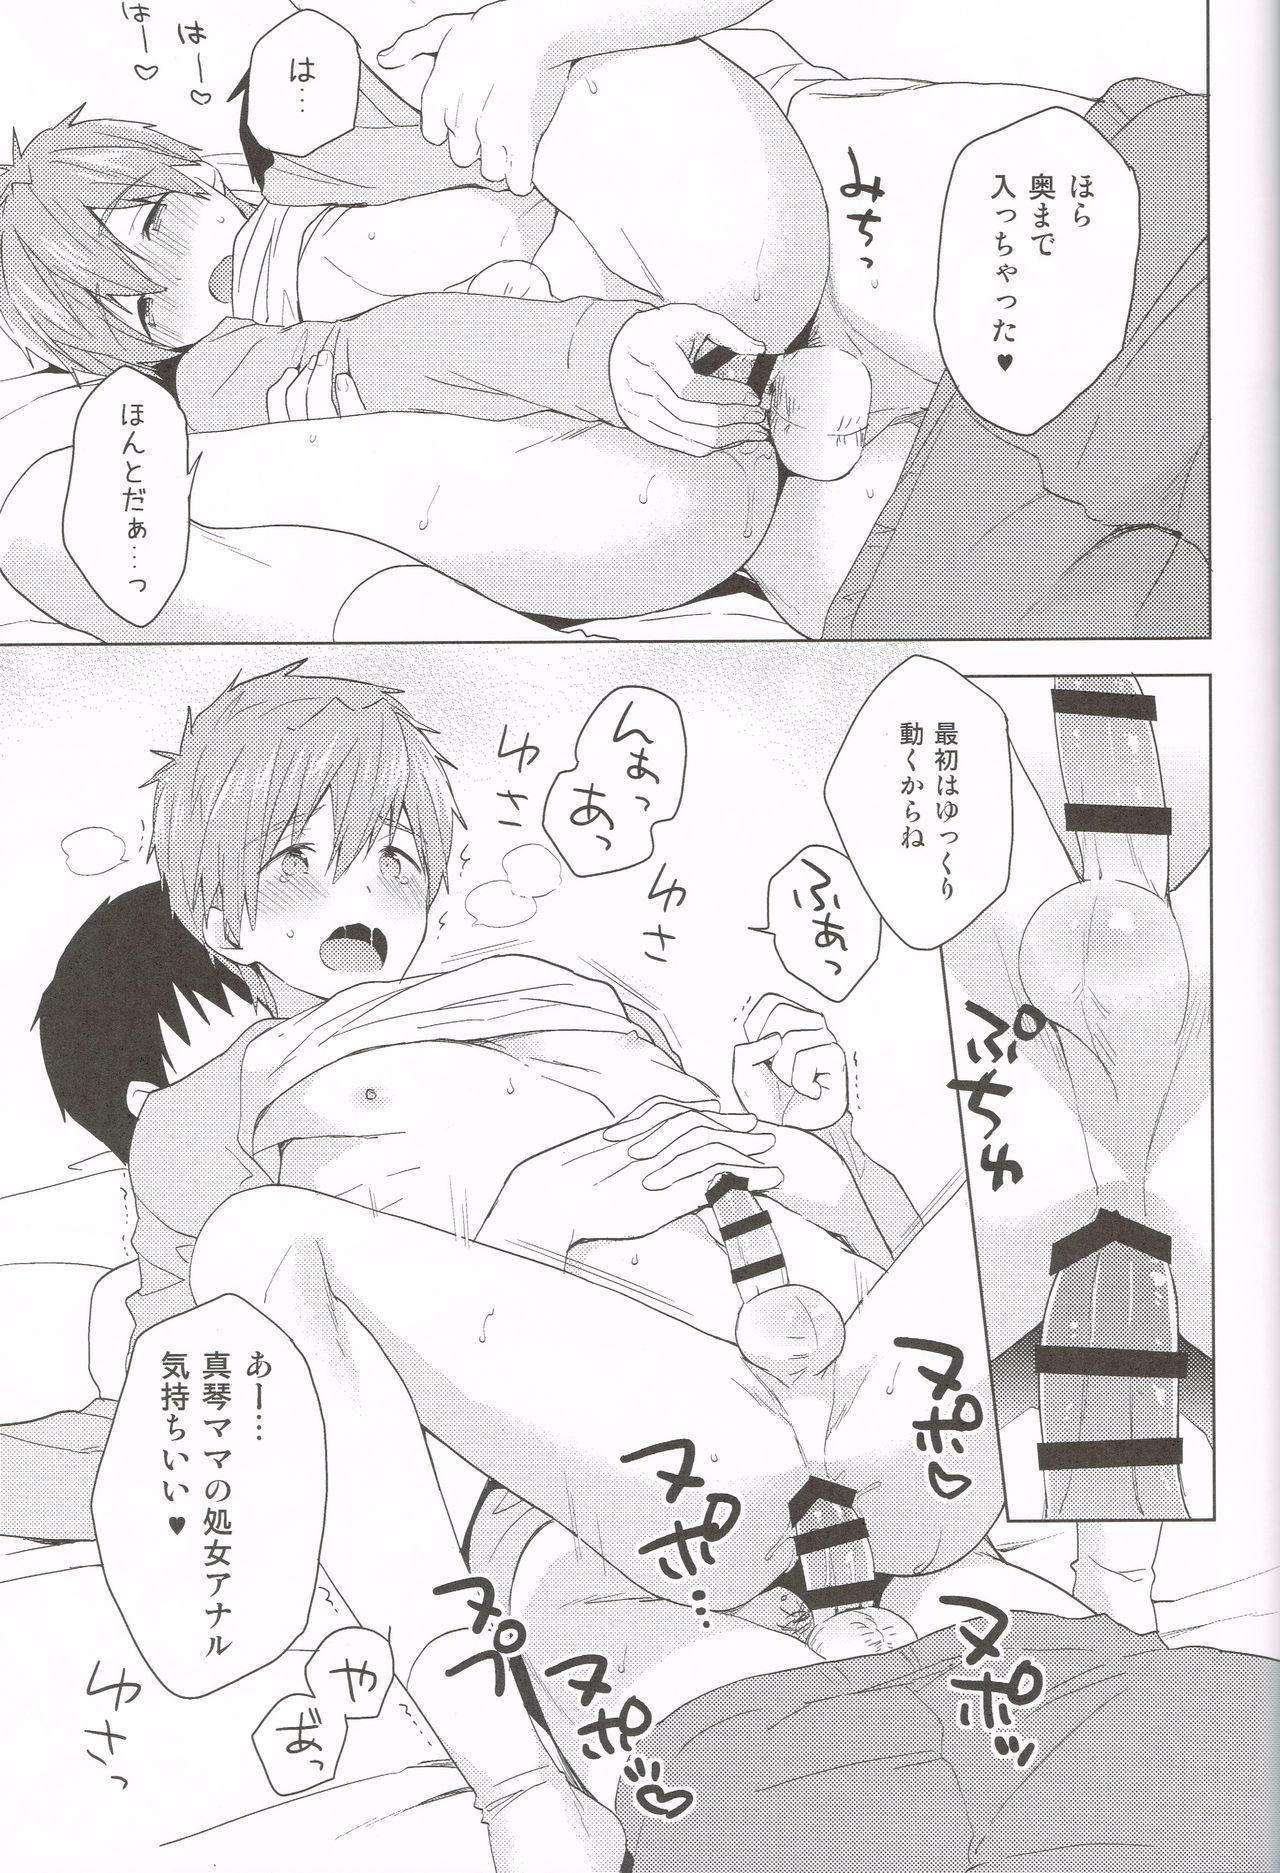 Makoto-kun to Omamagoto 17